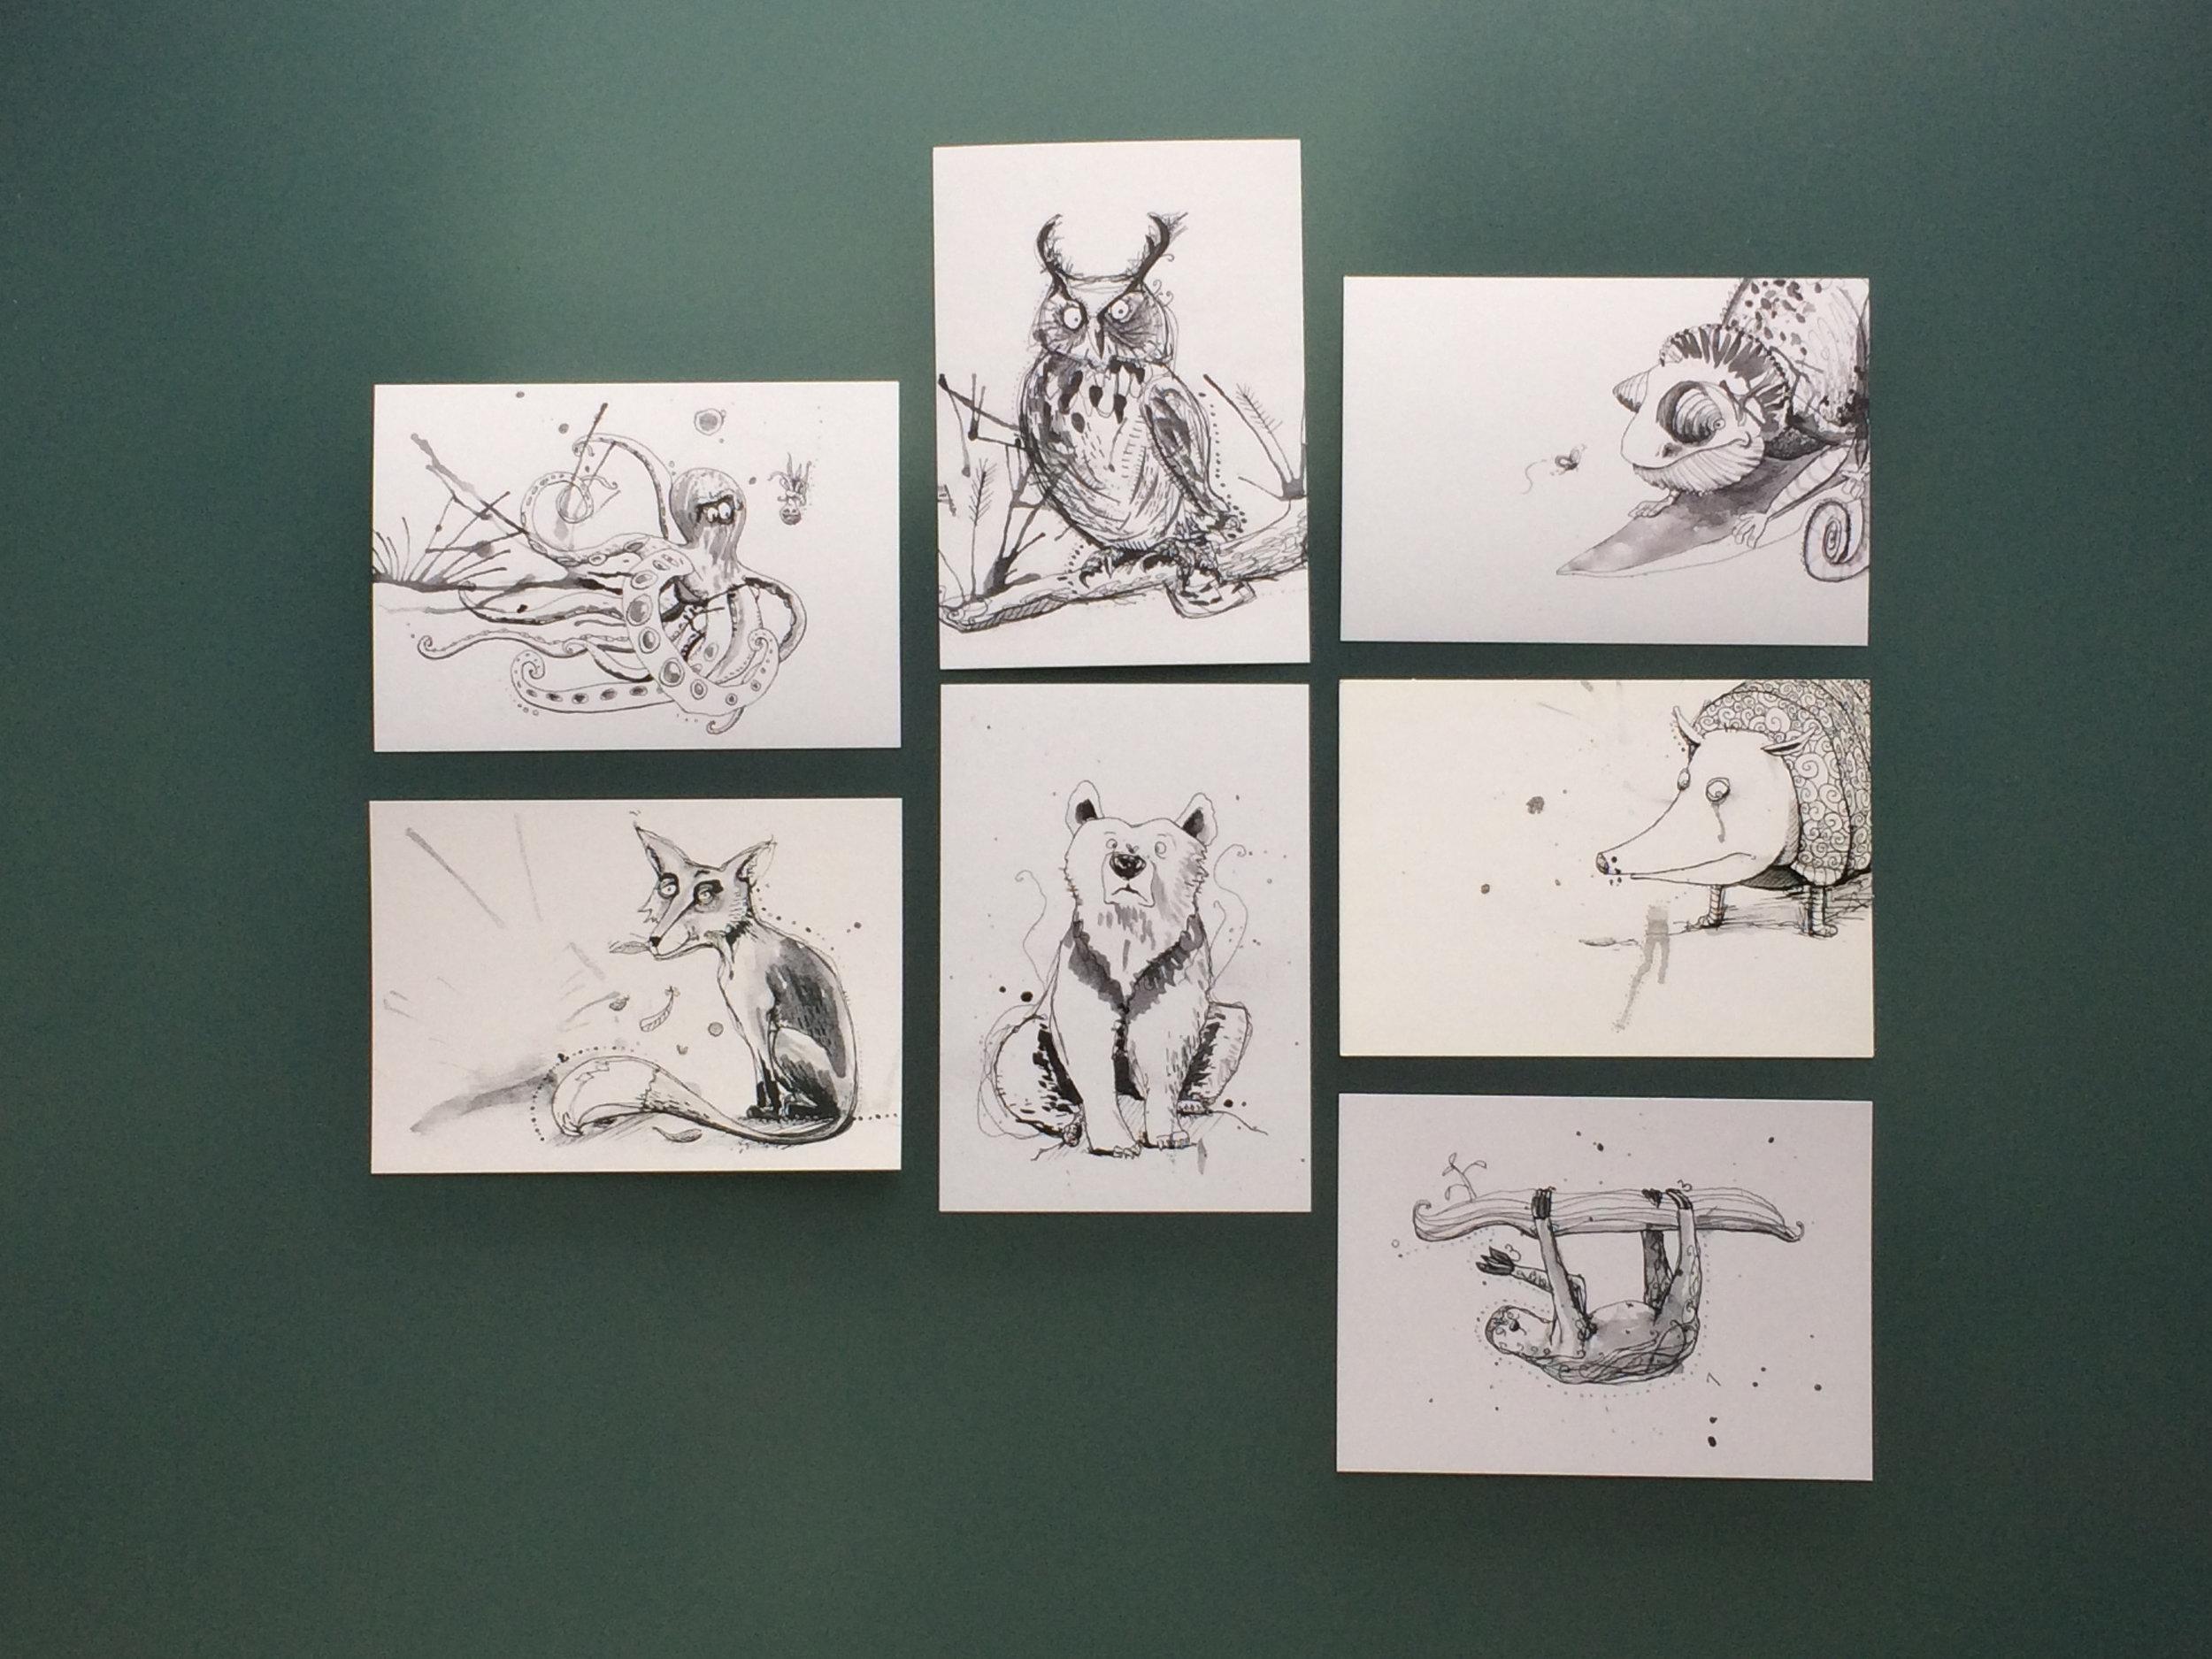 Selection of available Postcards / Auswahl an zu erwerbenden Postkarten